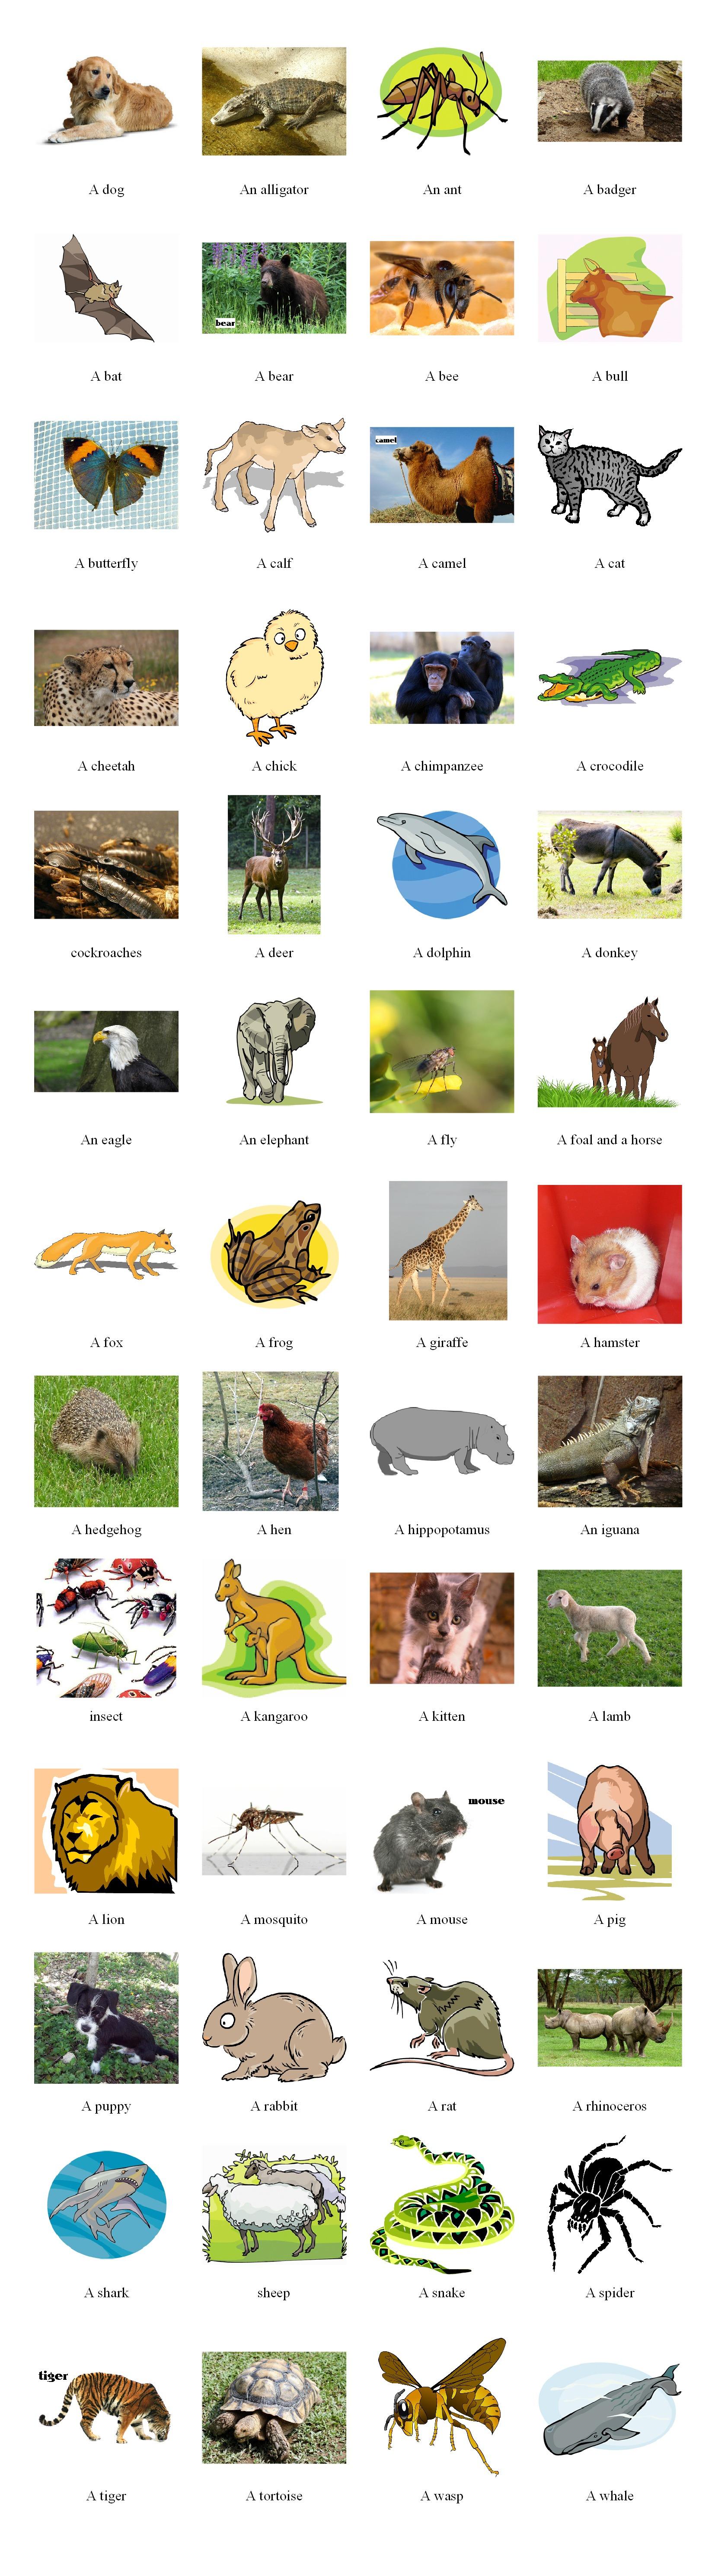 Pictionary animals 2